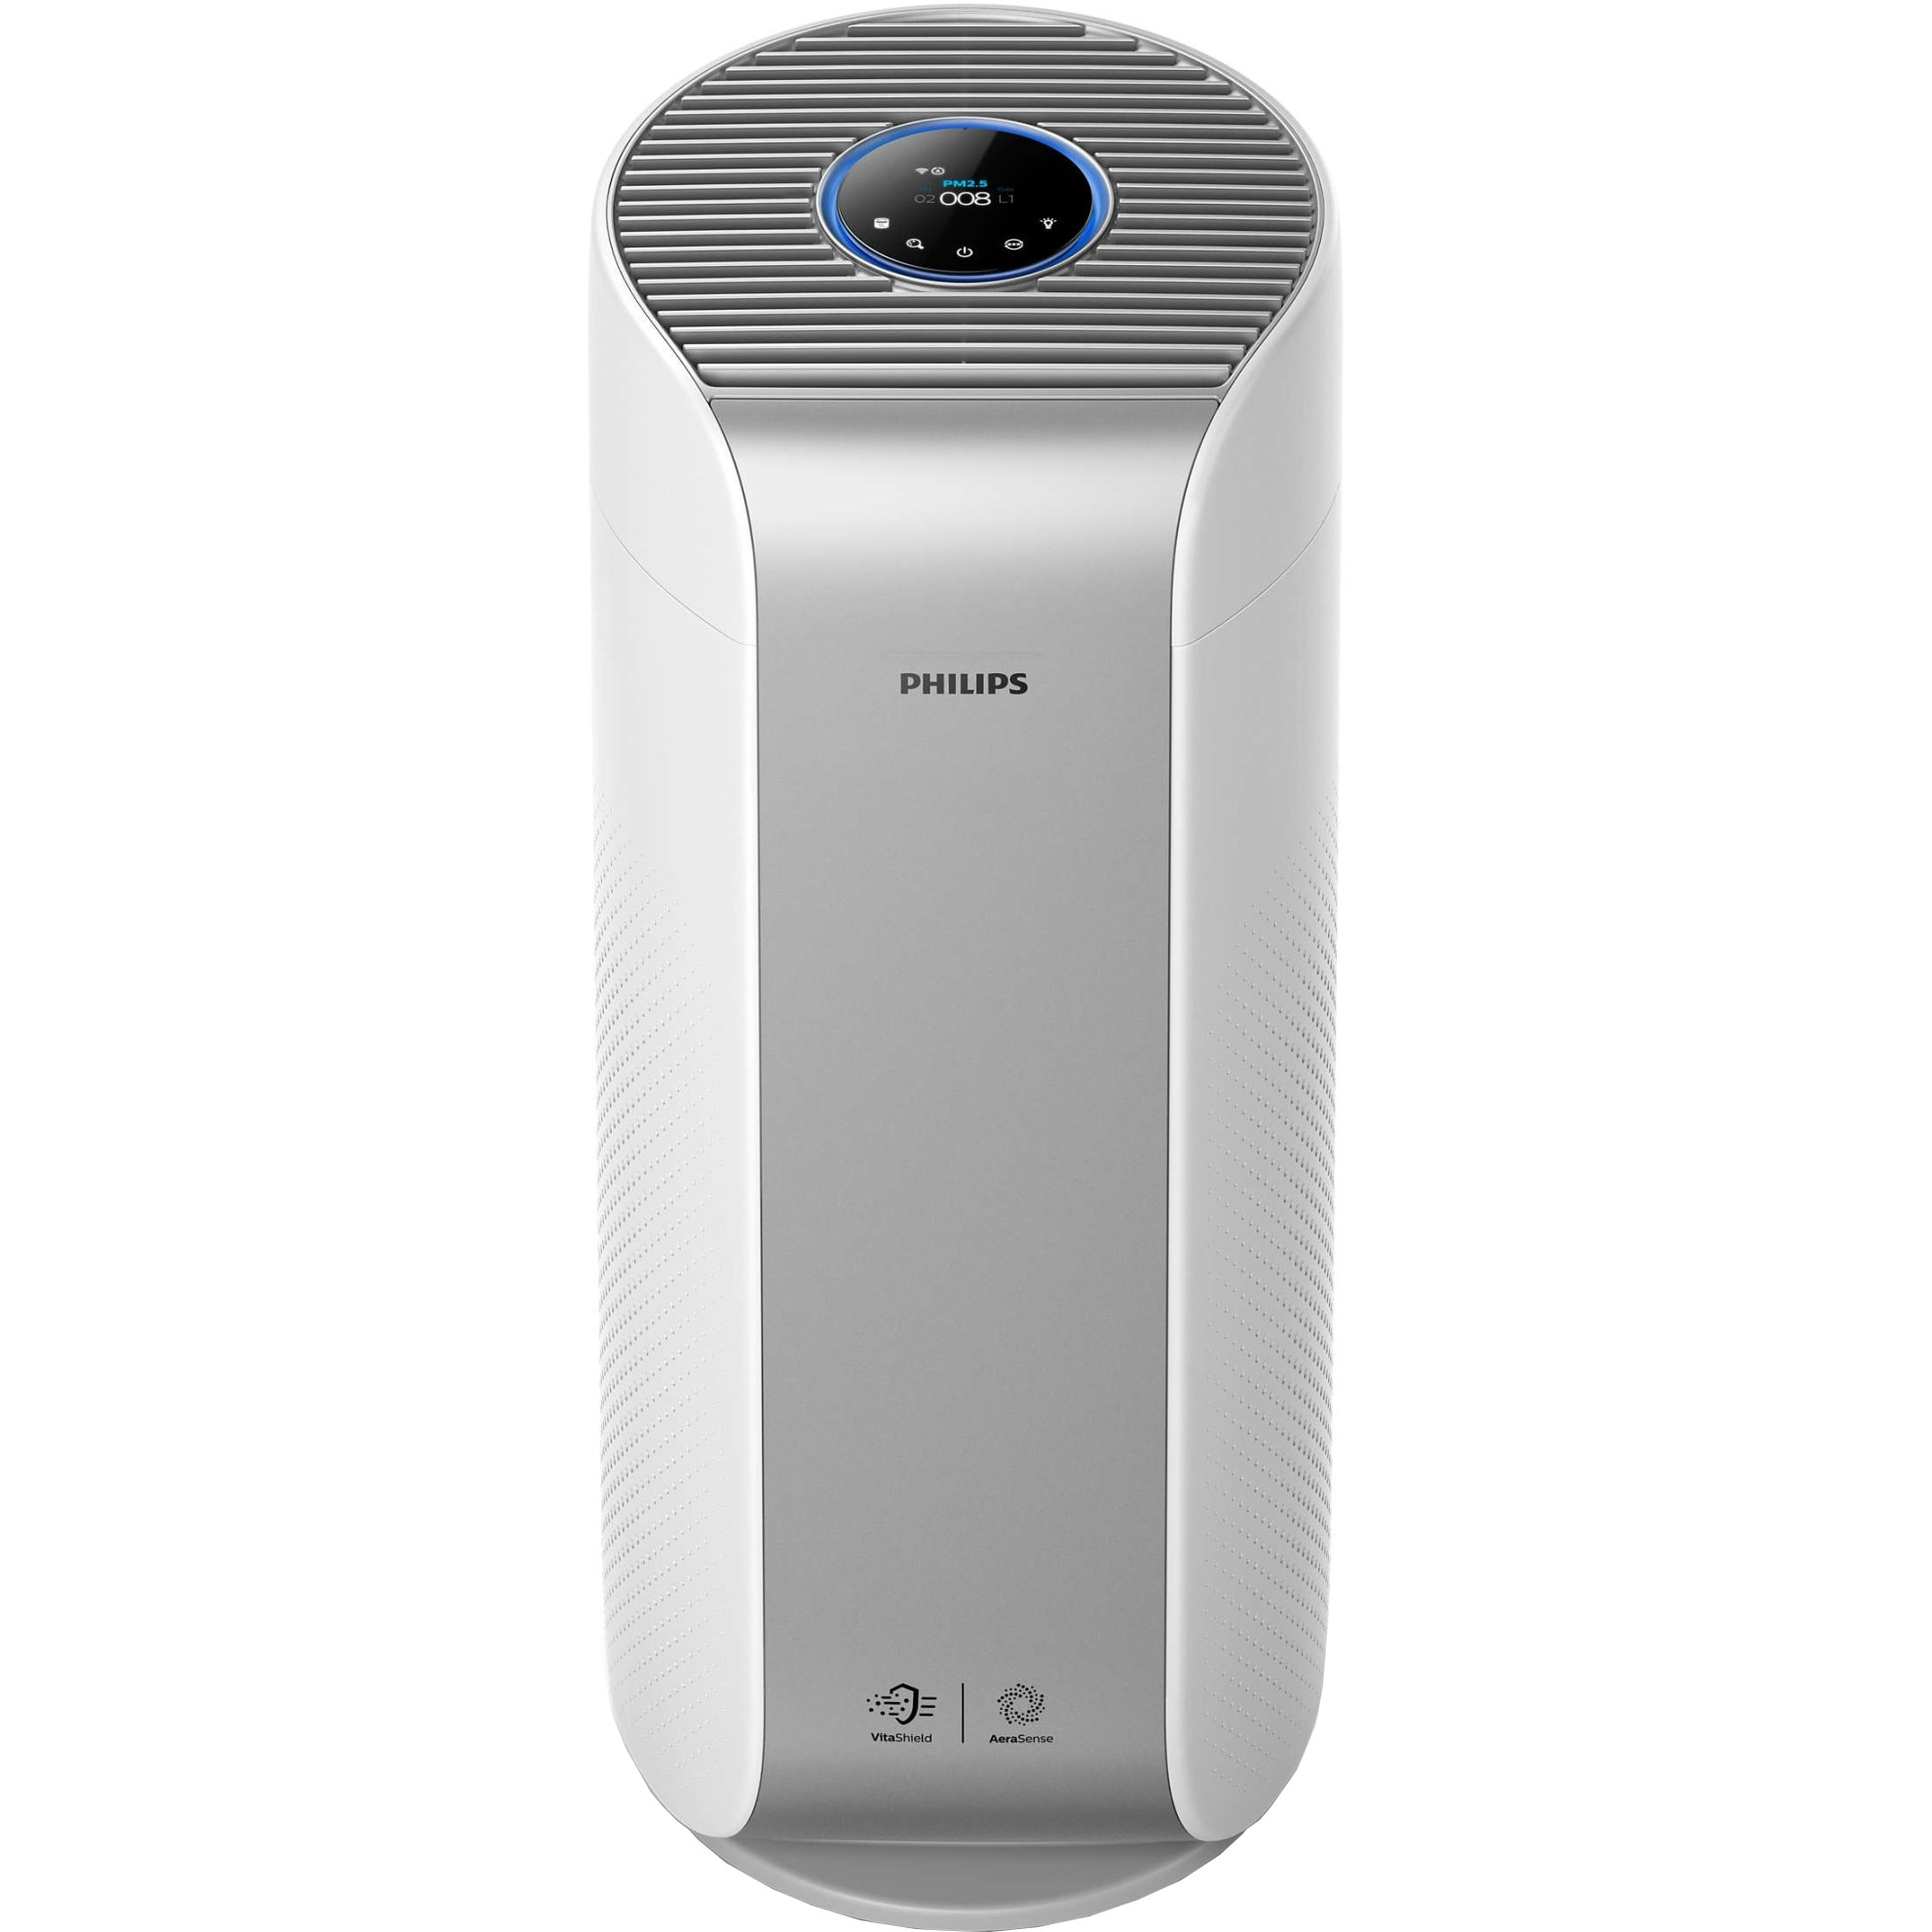 Fotografie Purificator de aer Philips AC3854/50, CADR 500 m3/h, AeraSense, VitaShield, Clean Home+, Senzor PM2.5, Argintiu